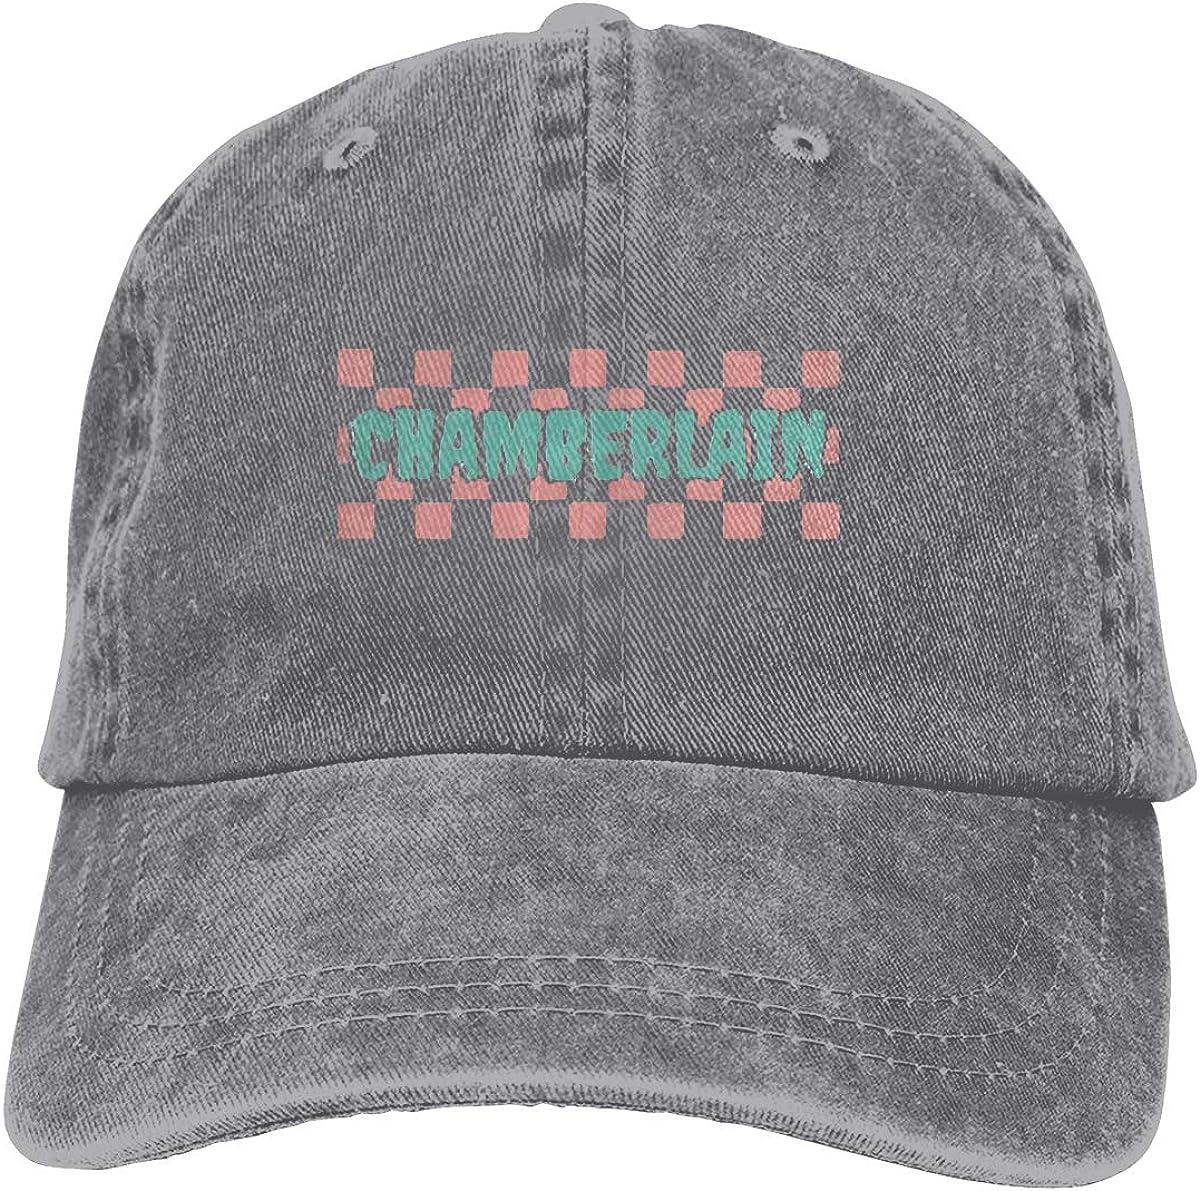 THORP.JENELLE Special Adult Emma Chamberlain YouTube Cowboy Hat Cap Unisex